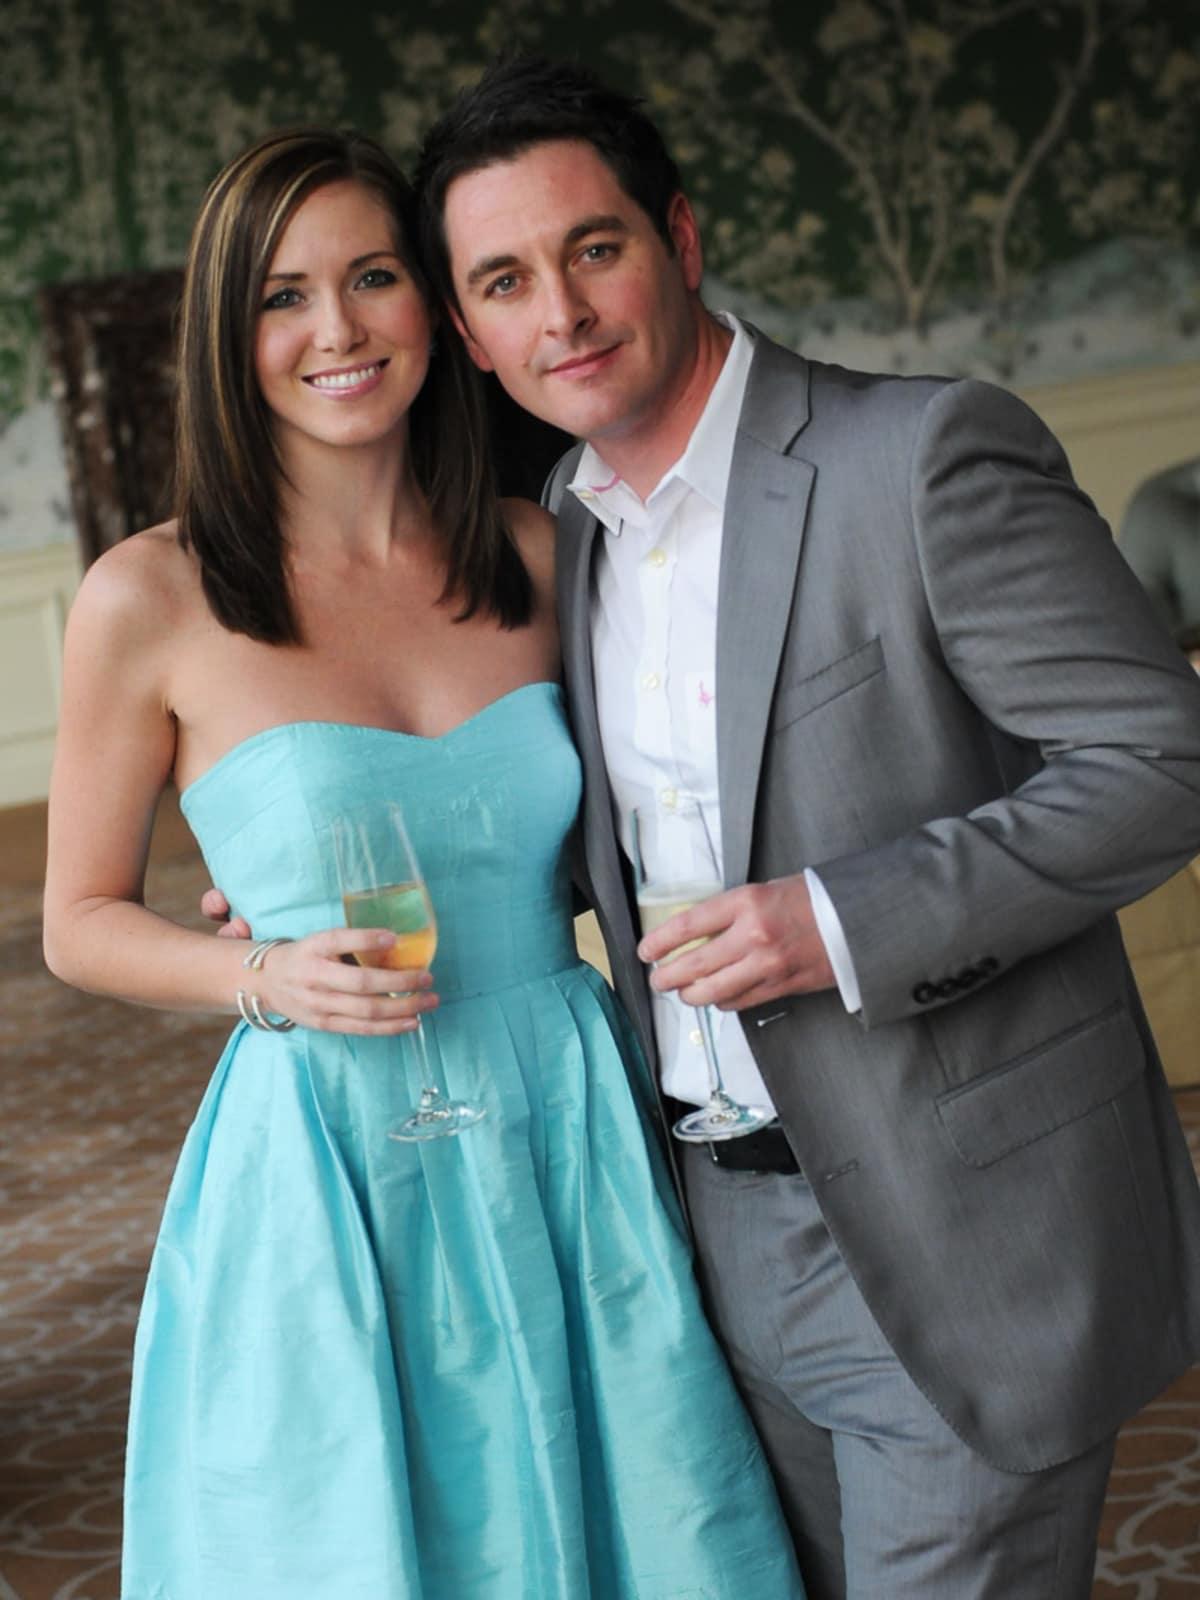 News_Small Steps Wine Classic_April 2011_Robin Parrish_Craig Hume